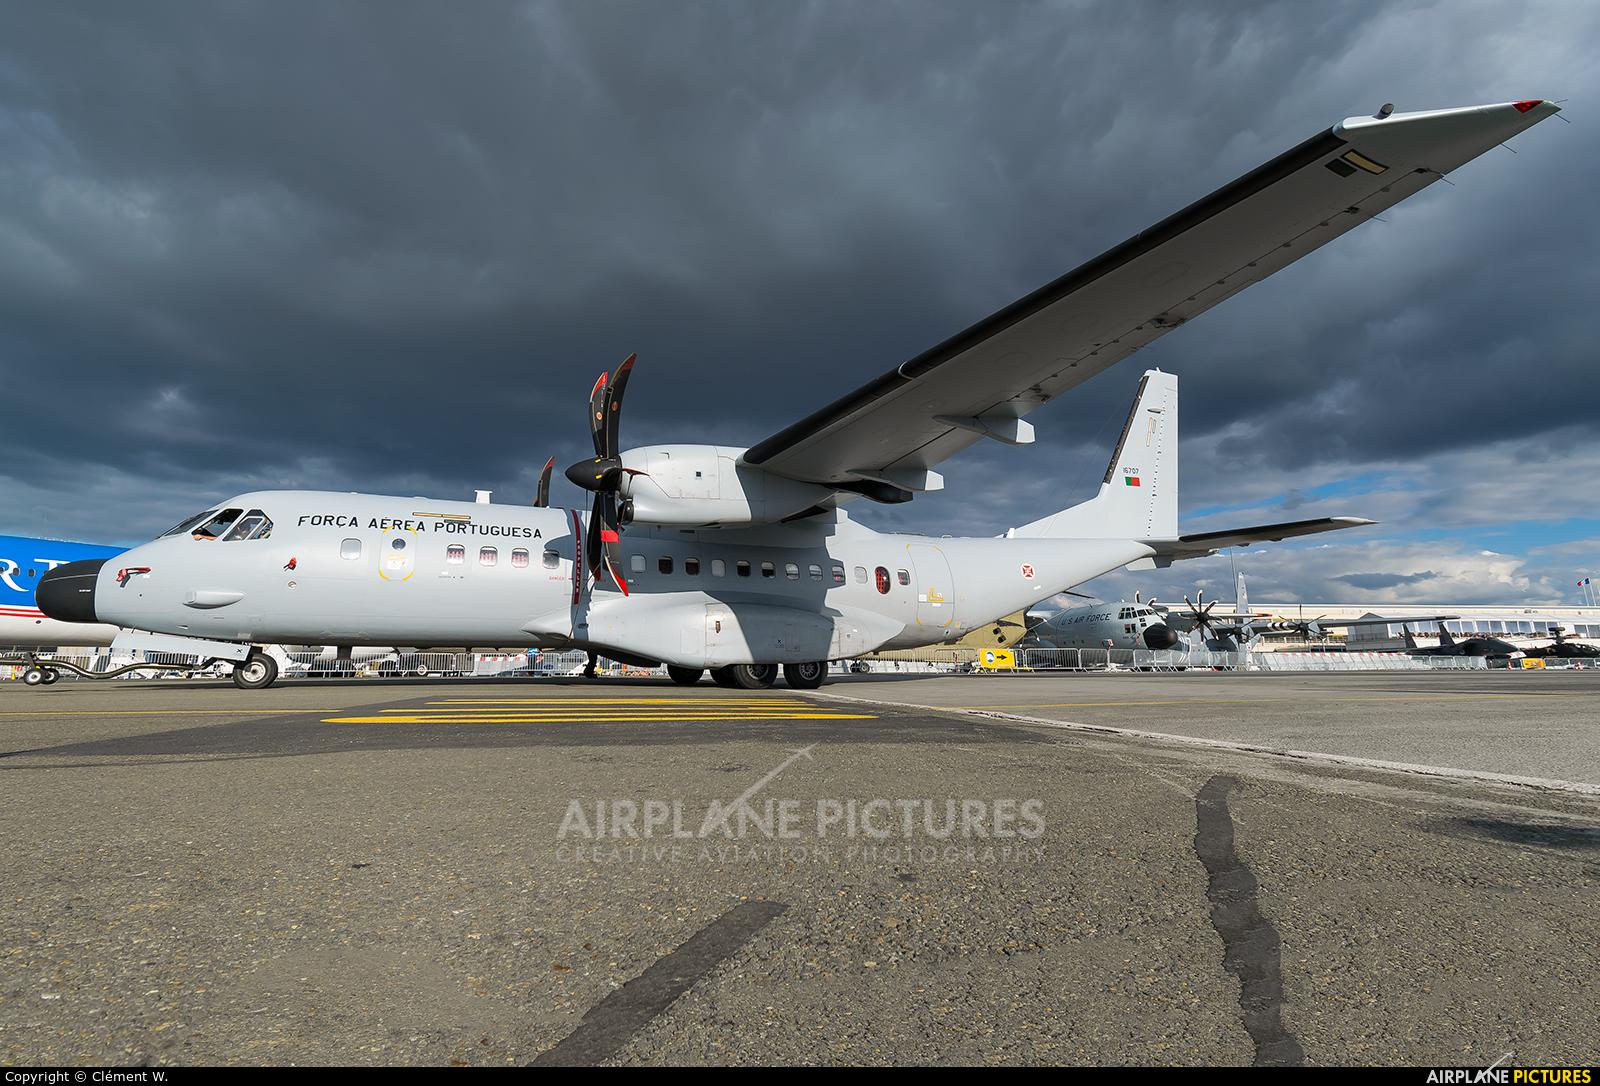 Portugal - Air Force 16707 aircraft at Paris - Le Bourget